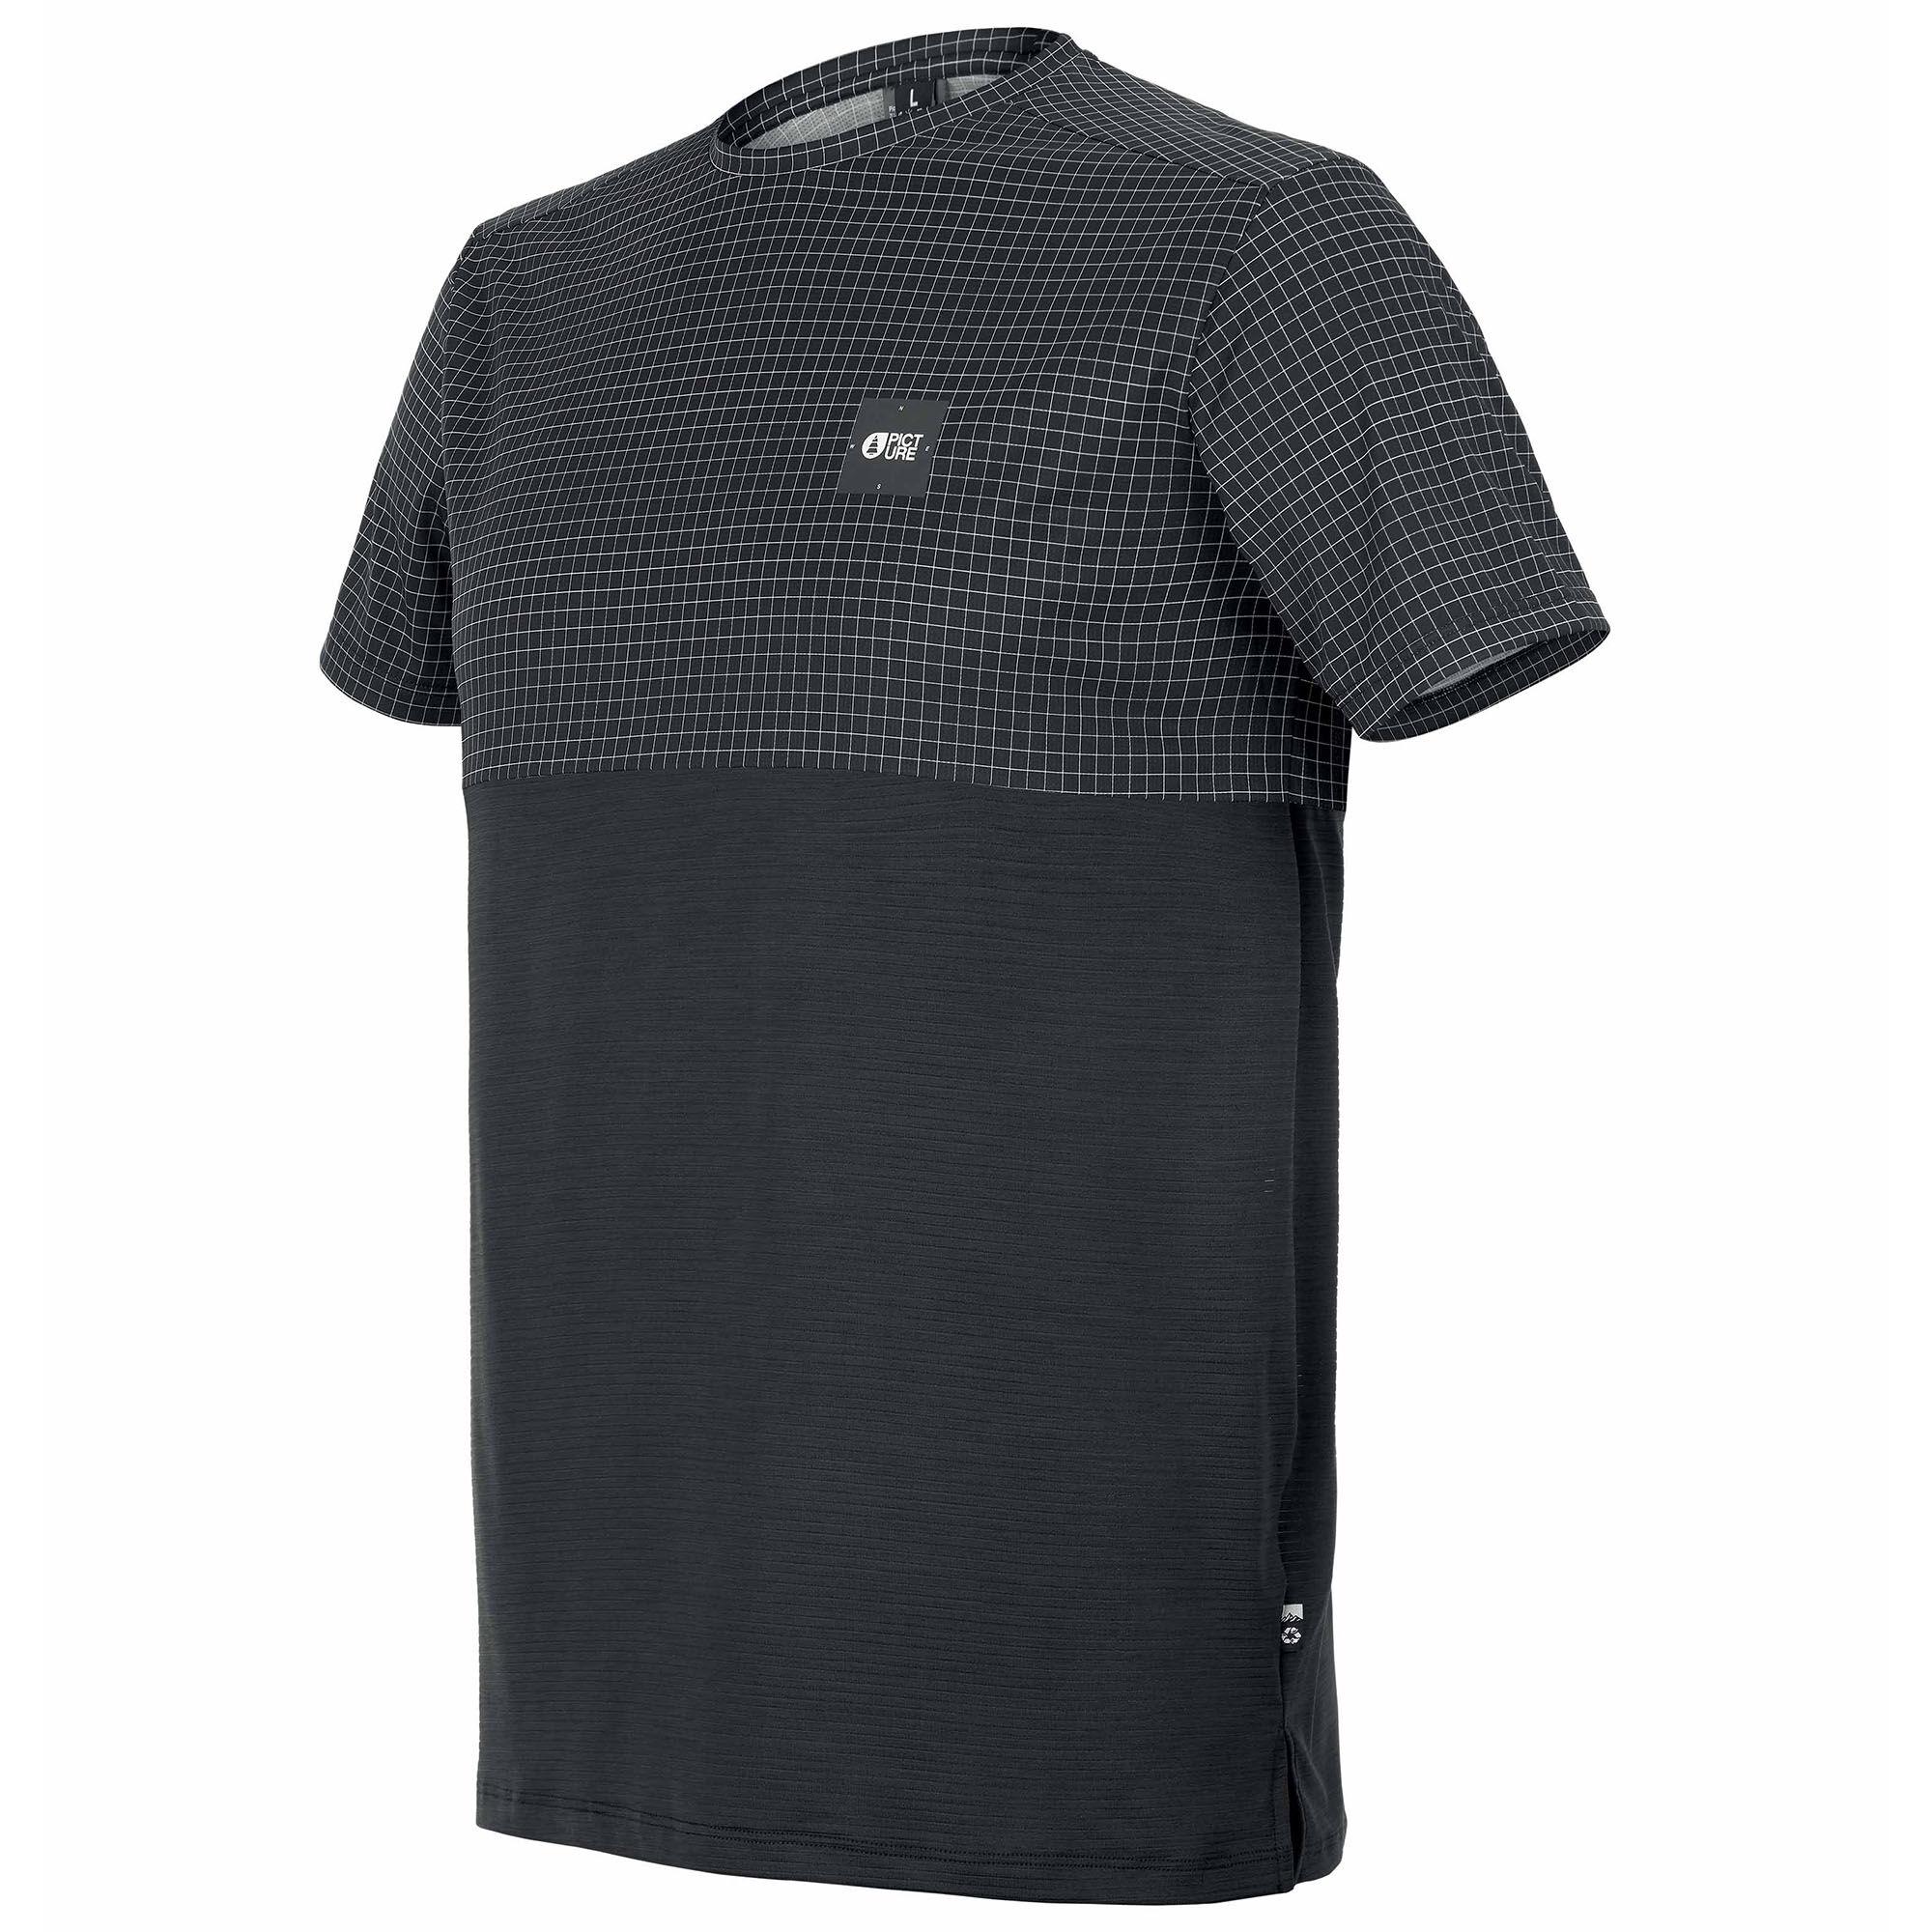 Picture Organic Clothing Men's Rockers T Shirt  - Black - Size: Large